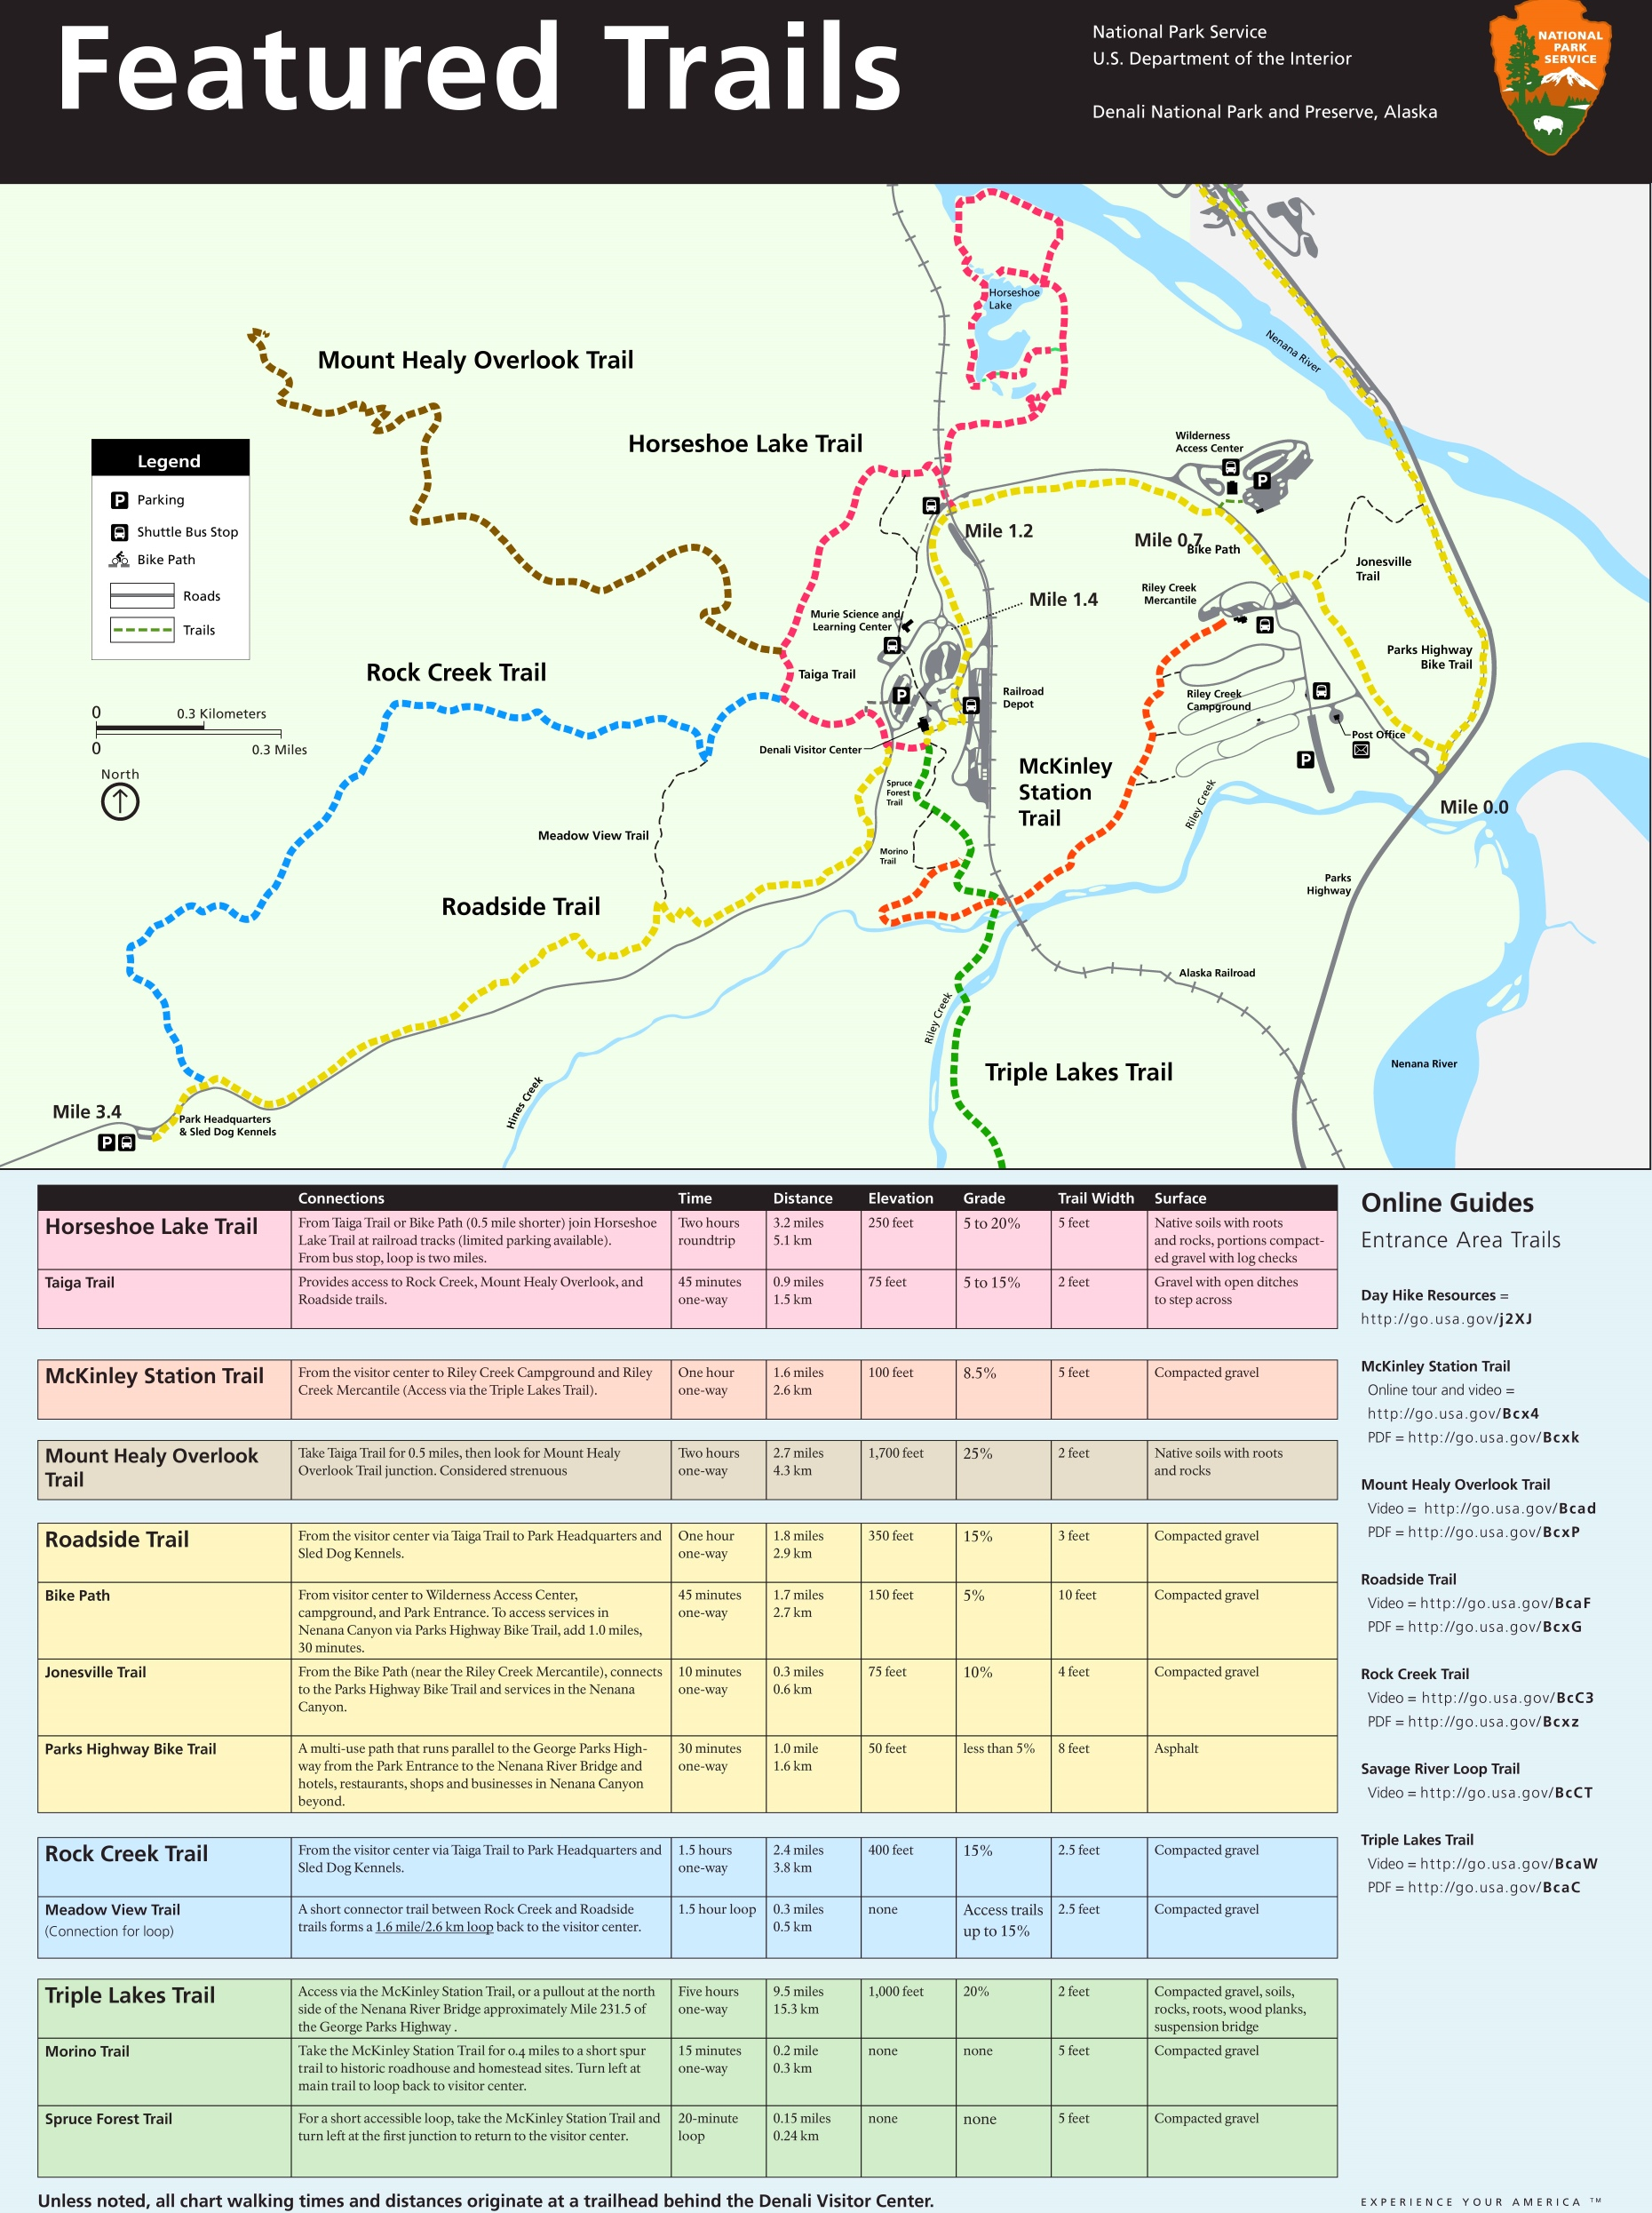 Denali featured trails map